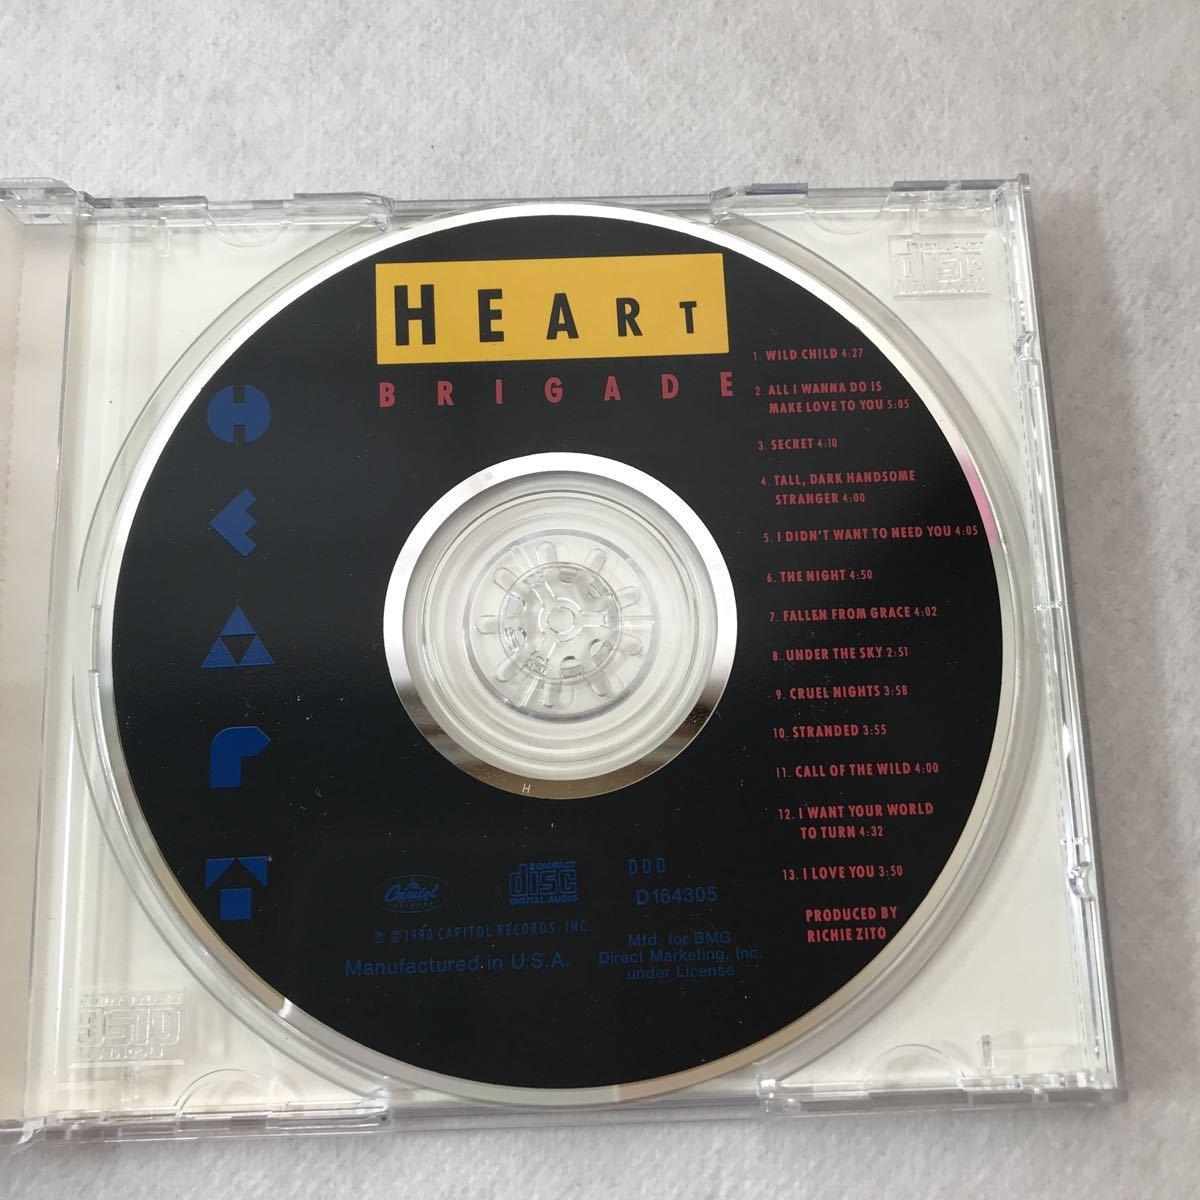 CD HEART BRIGADE